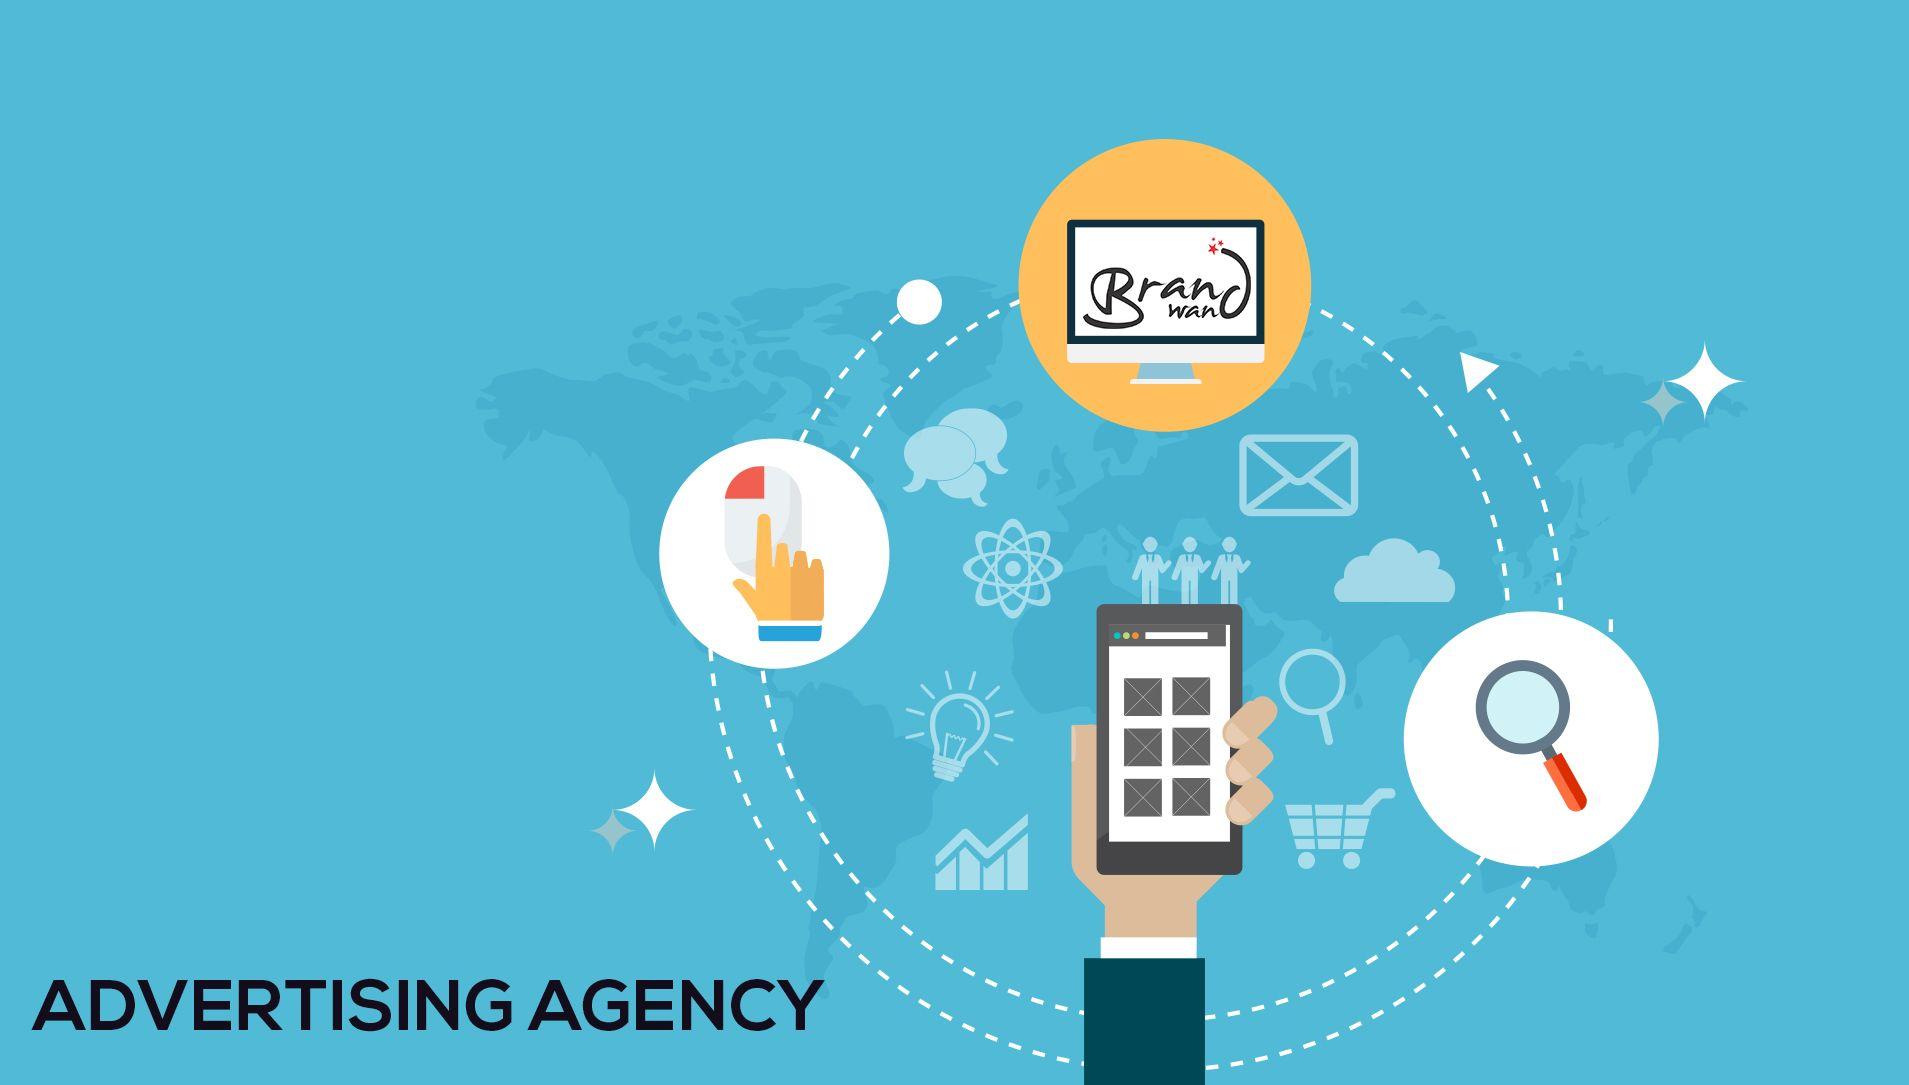 Brandwand advertising agency in delhi ncr advertising